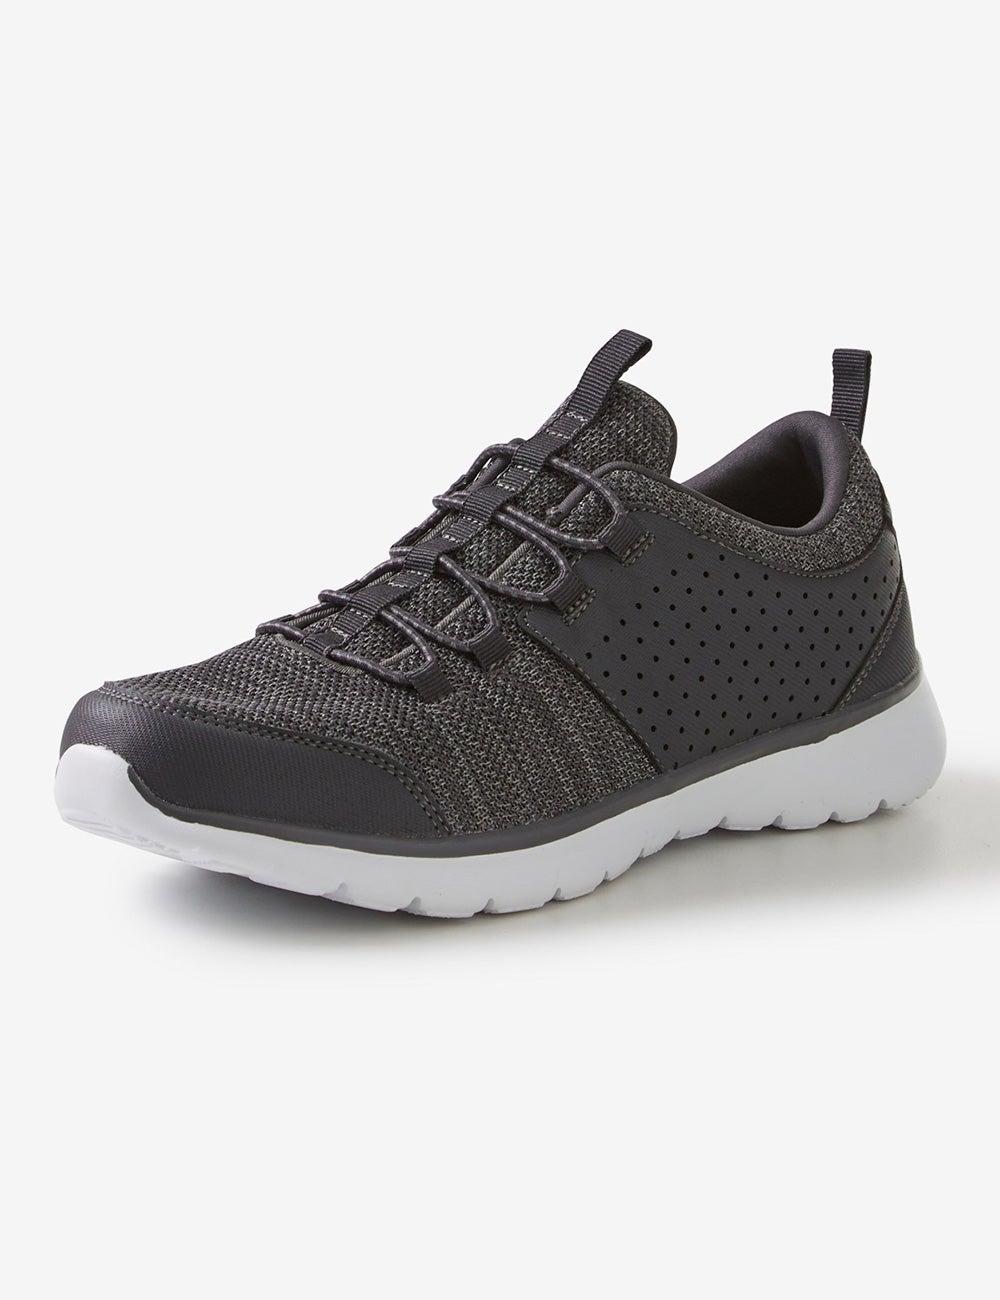 sport memory foam shoes target Sale,up